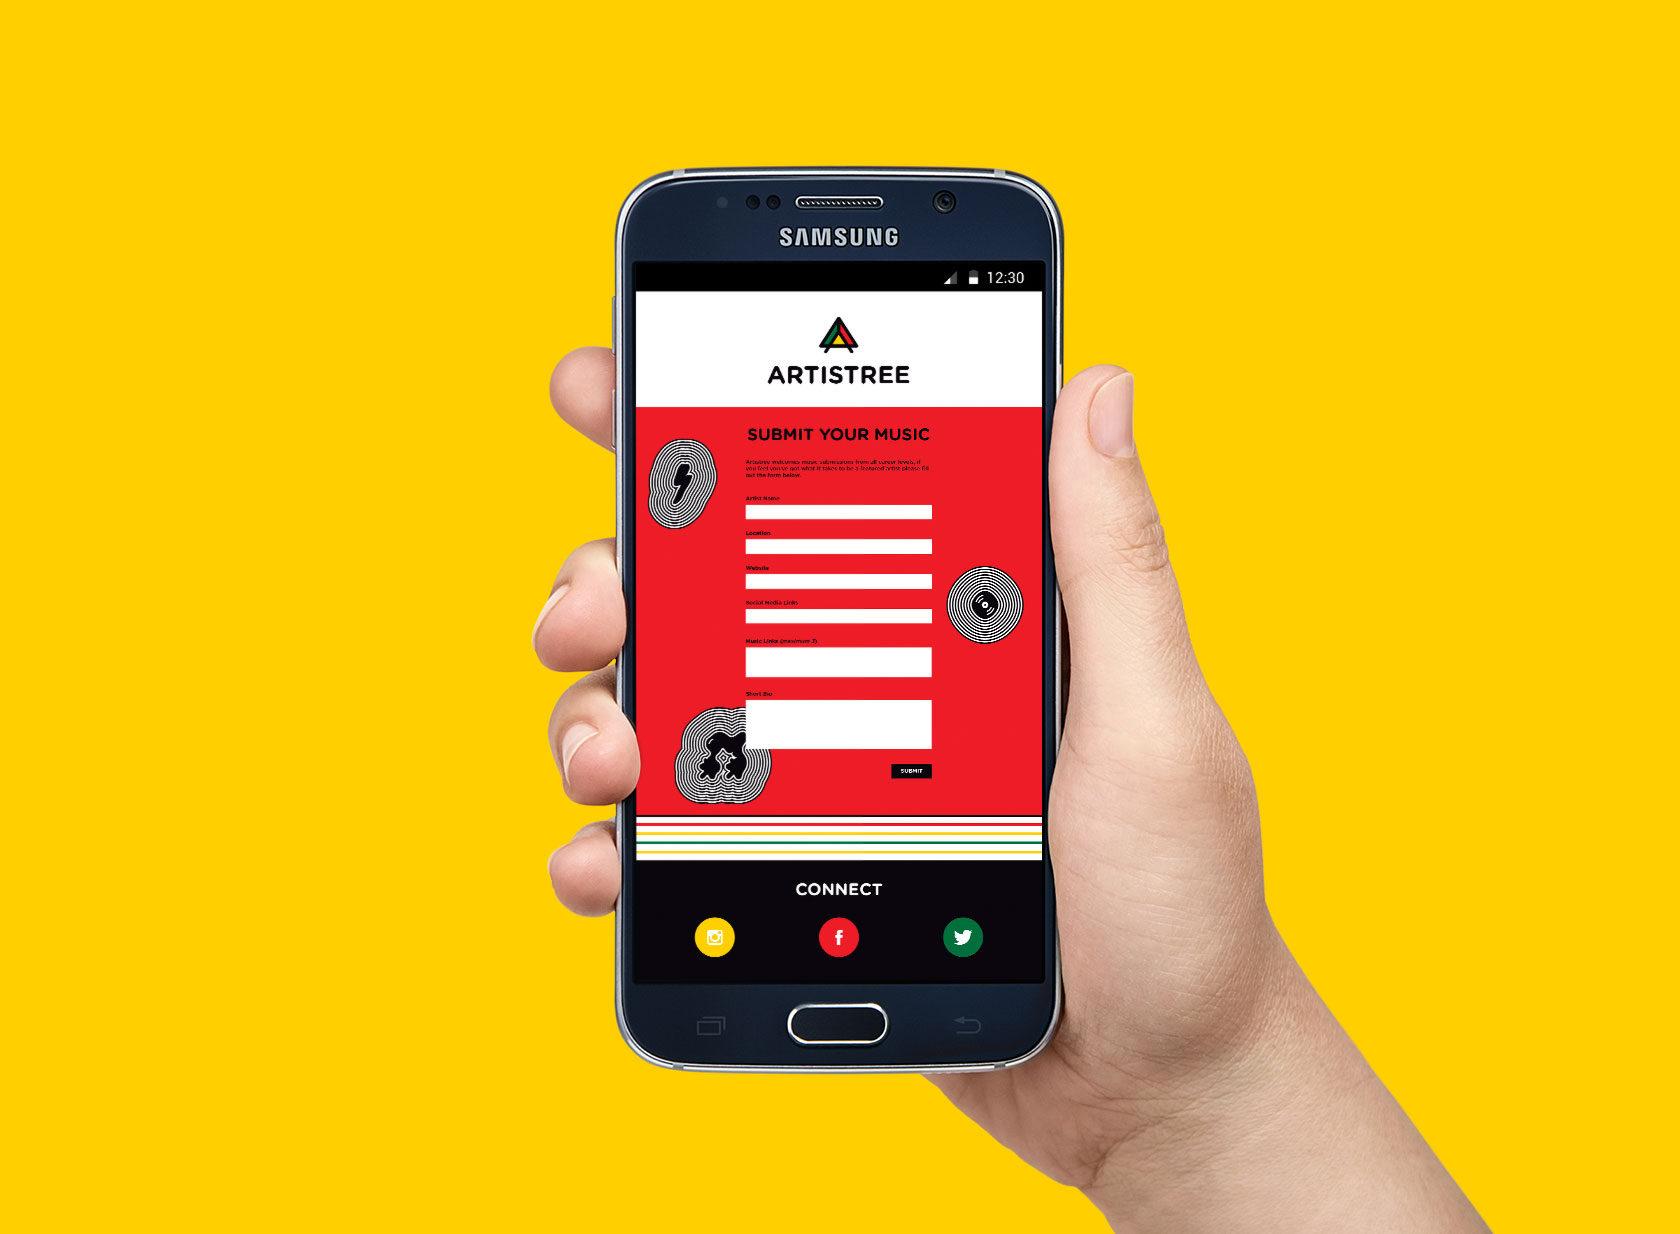 Artistree-mobile-website-design-by-Furia